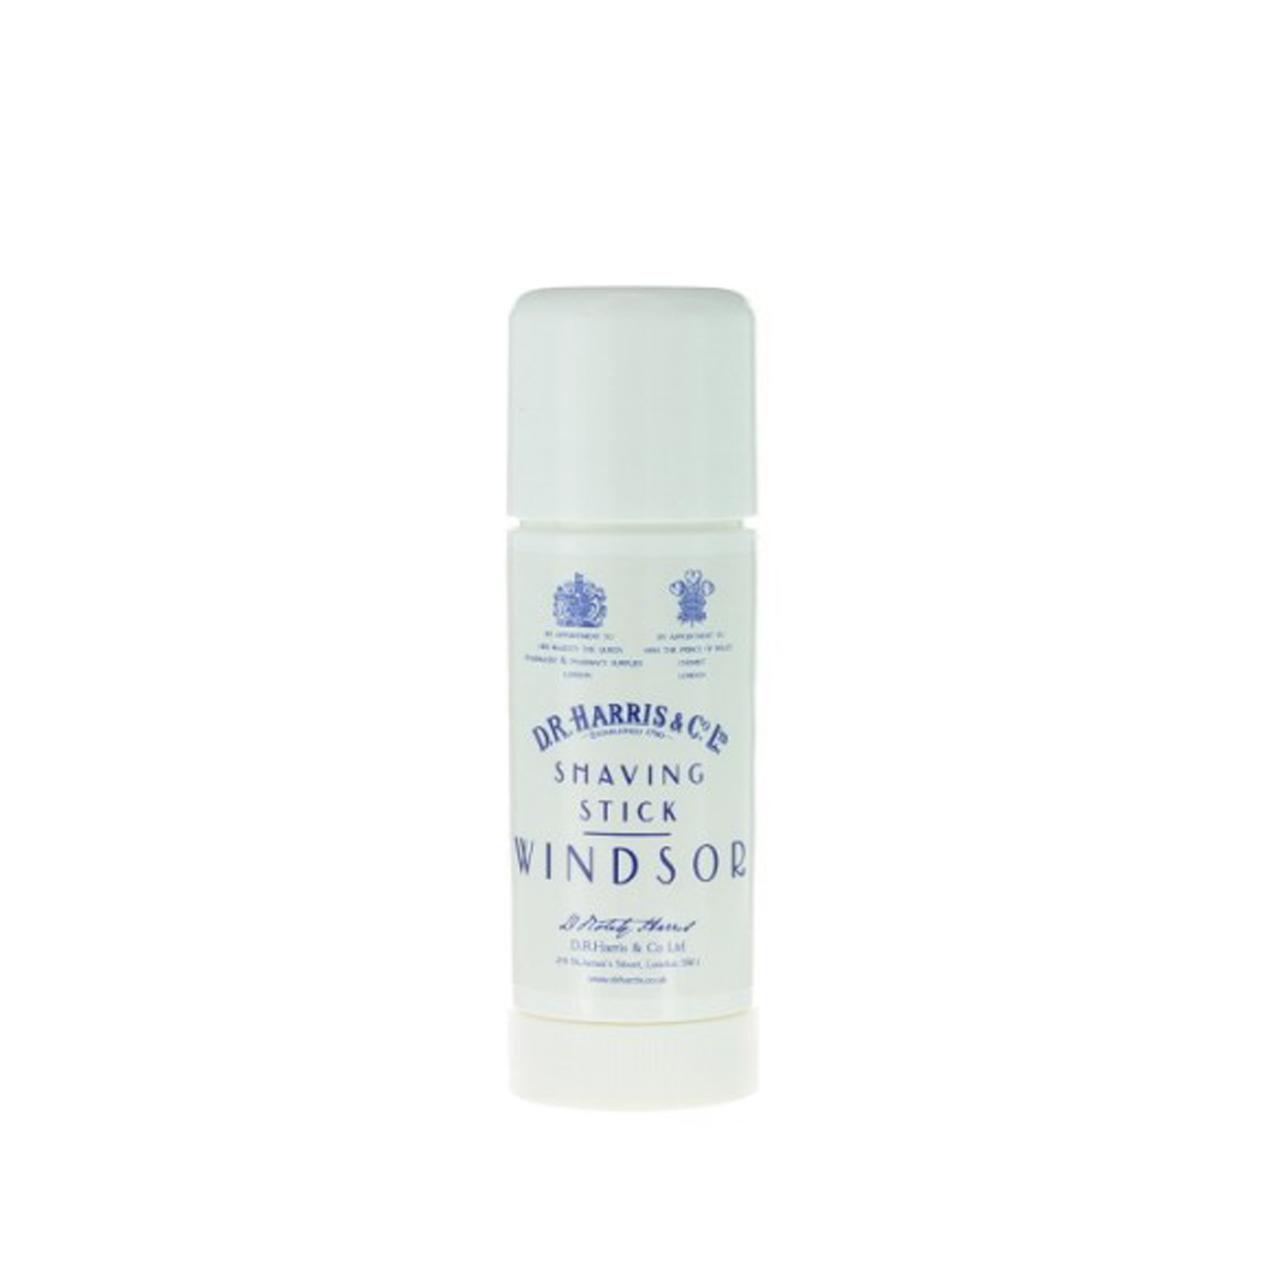 Windsor - Shaving Soap Stick